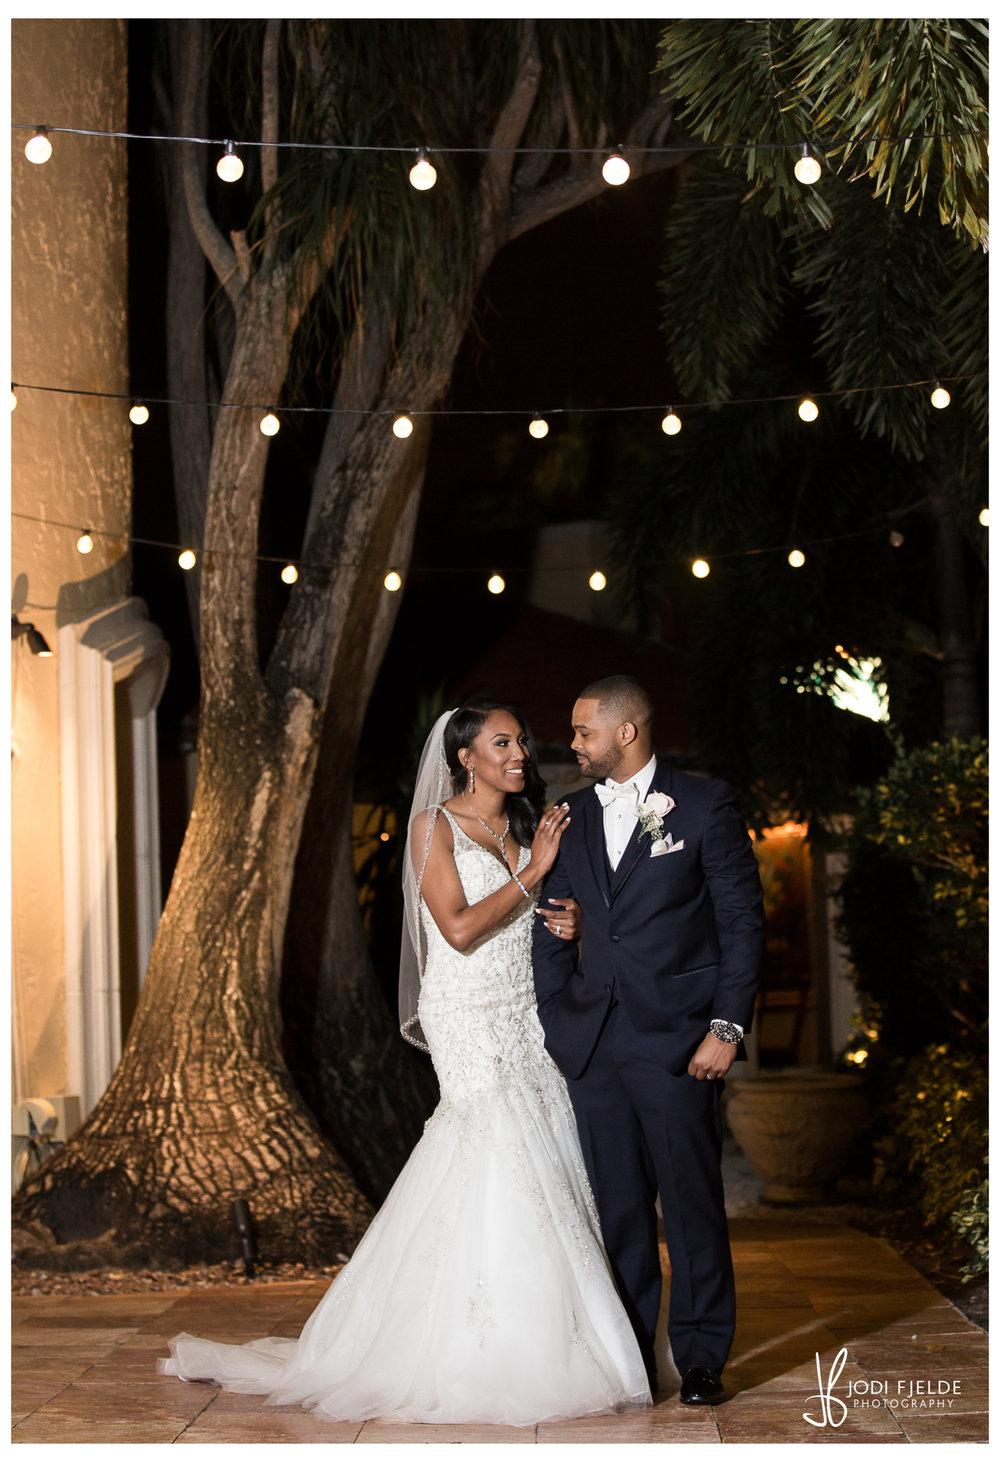 Benvenuto_wedding_Boynton_Beach_Jodi_Fjelde_Photography_Nikki_Otis_married_19.jpg